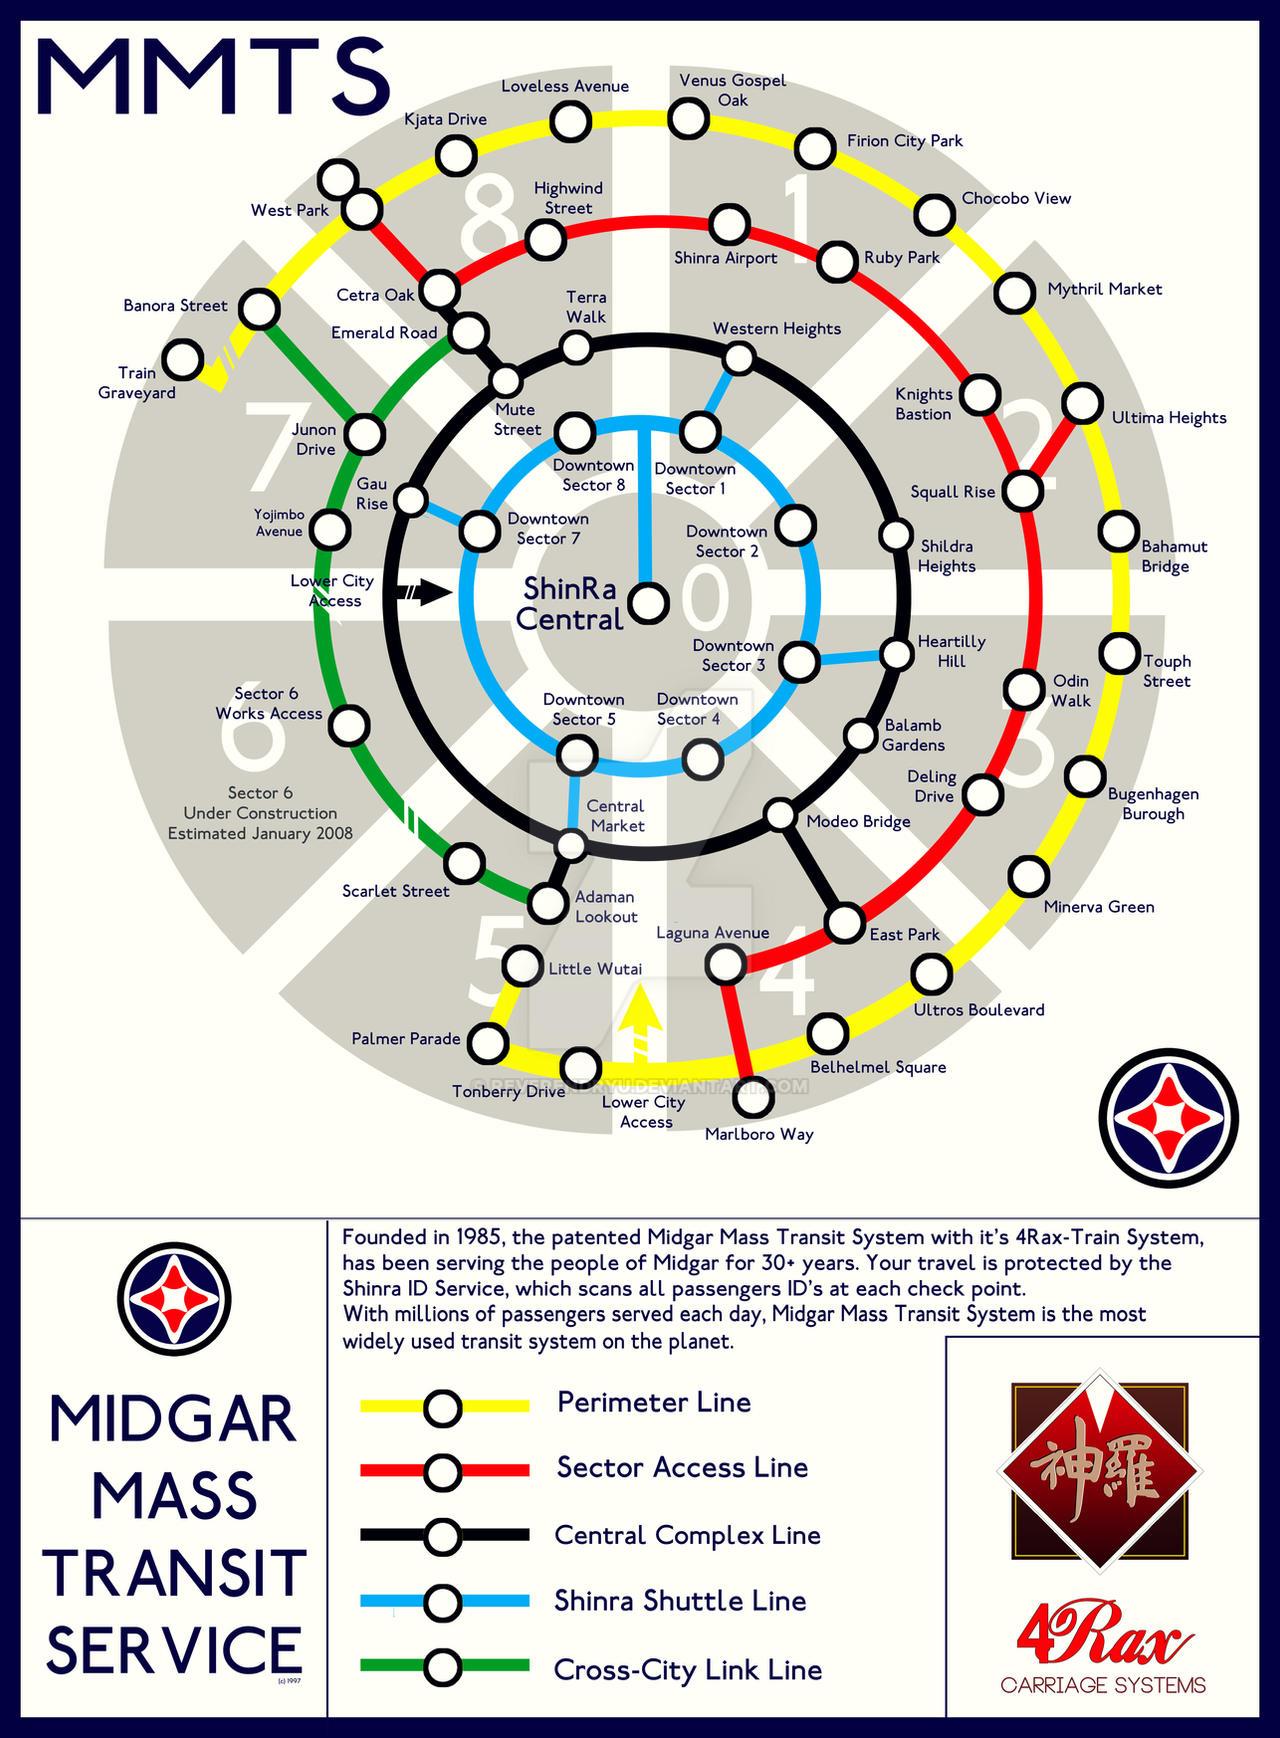 final fantasy vii midgar mass transit system map by reverendryu